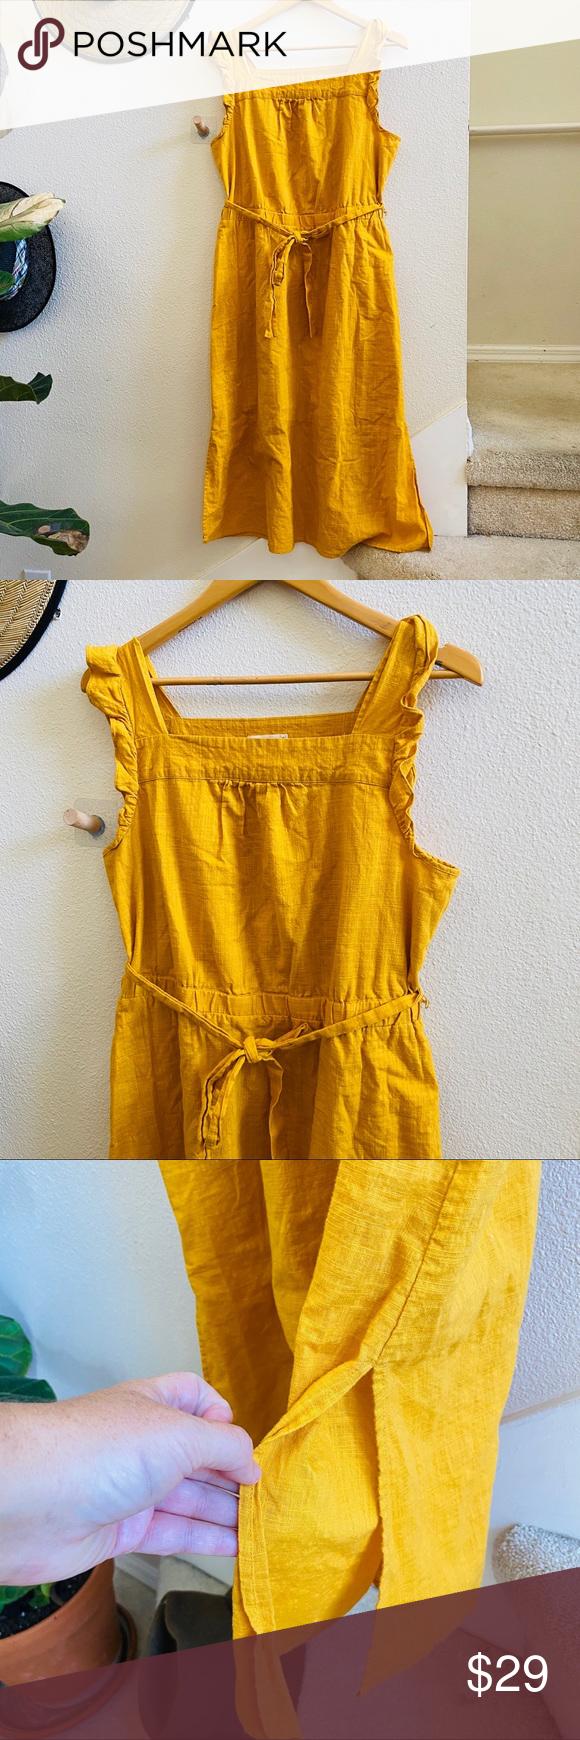 Universal Thread Womens Jumpsuit Jumper Mustard Yellow Gold Pocket Cotton Blend